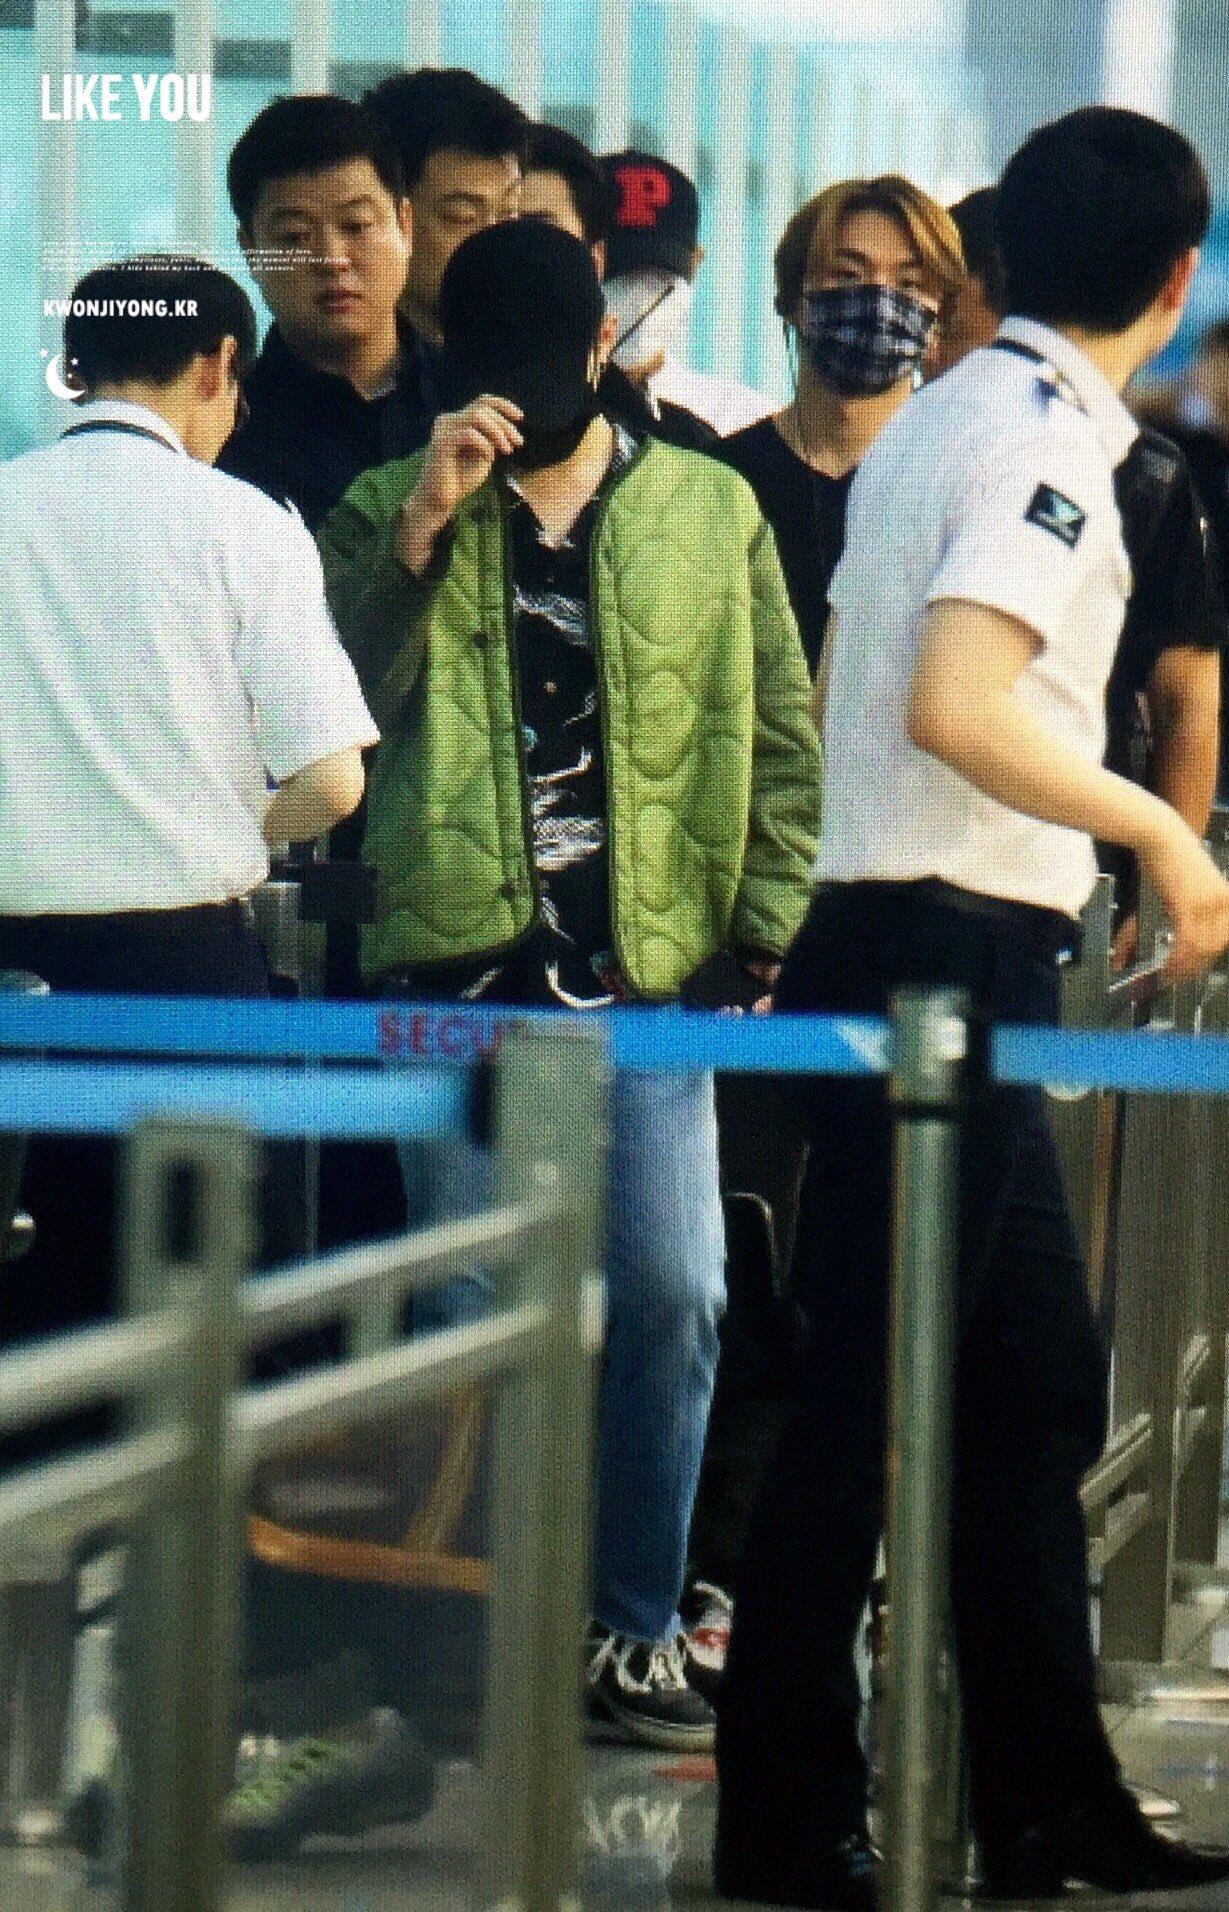 Big Bang - Incheon Airport - 30jun2016 - likeyou_GD - 09.jpg